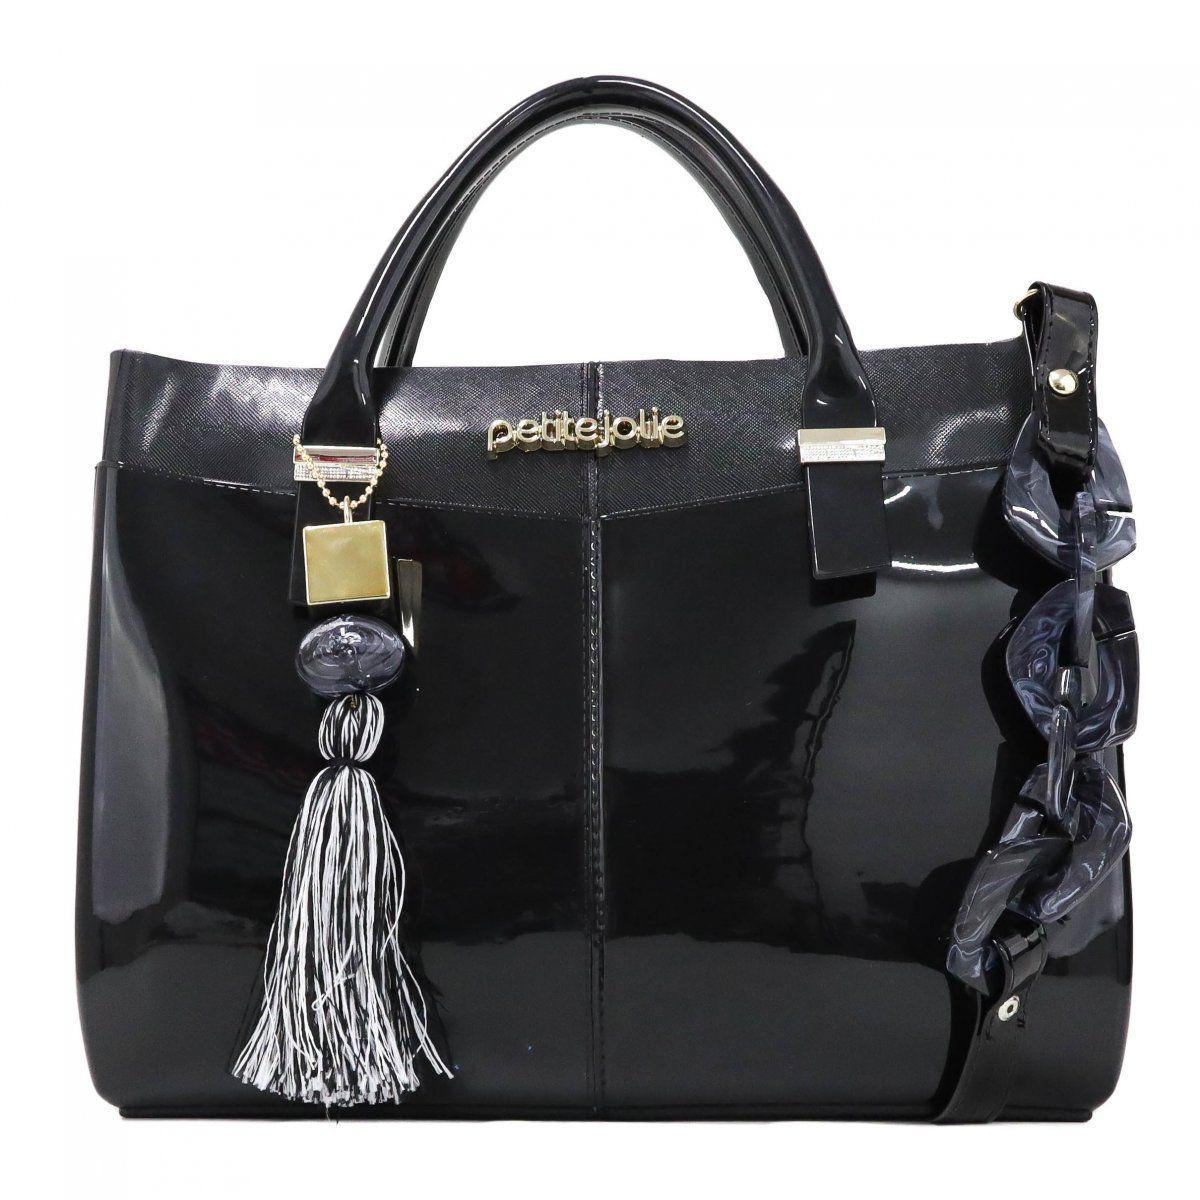 5dbc492a6 Bolsa Petite Jolie Worky Bag PJ3799 - Prime Bolsas ...